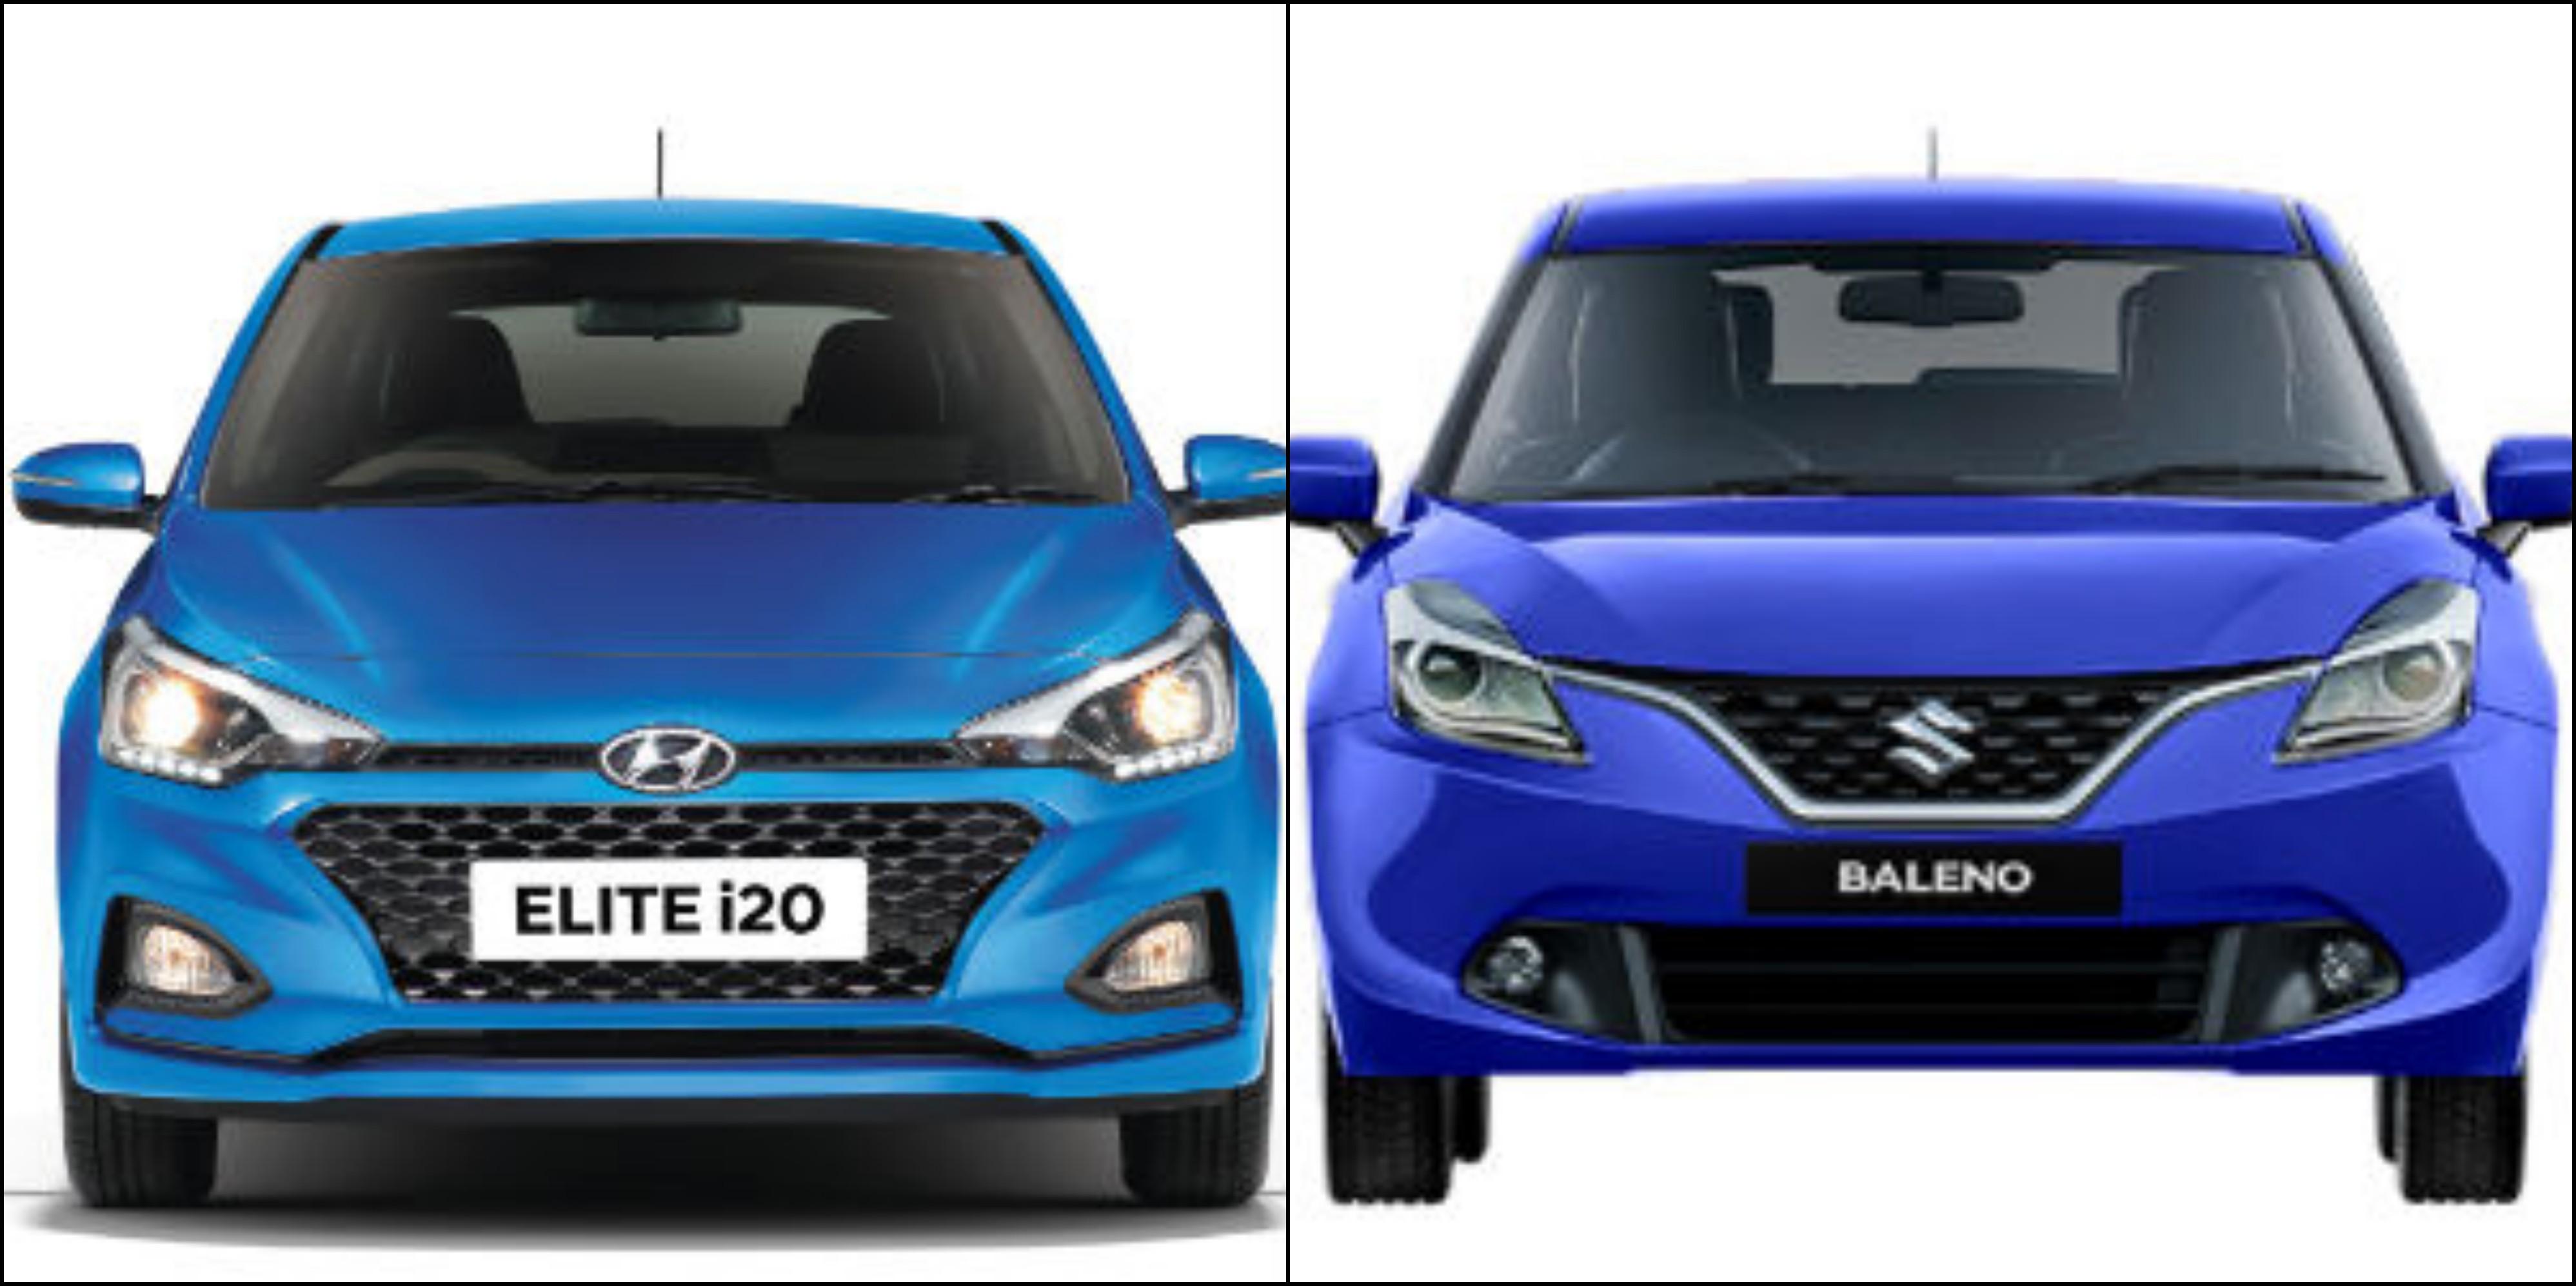 New Hyundai i20 Facelift Vs Maruti Baleno Comparison: Price, Design,  Specifications, Features & Mileage - DriveSpark News